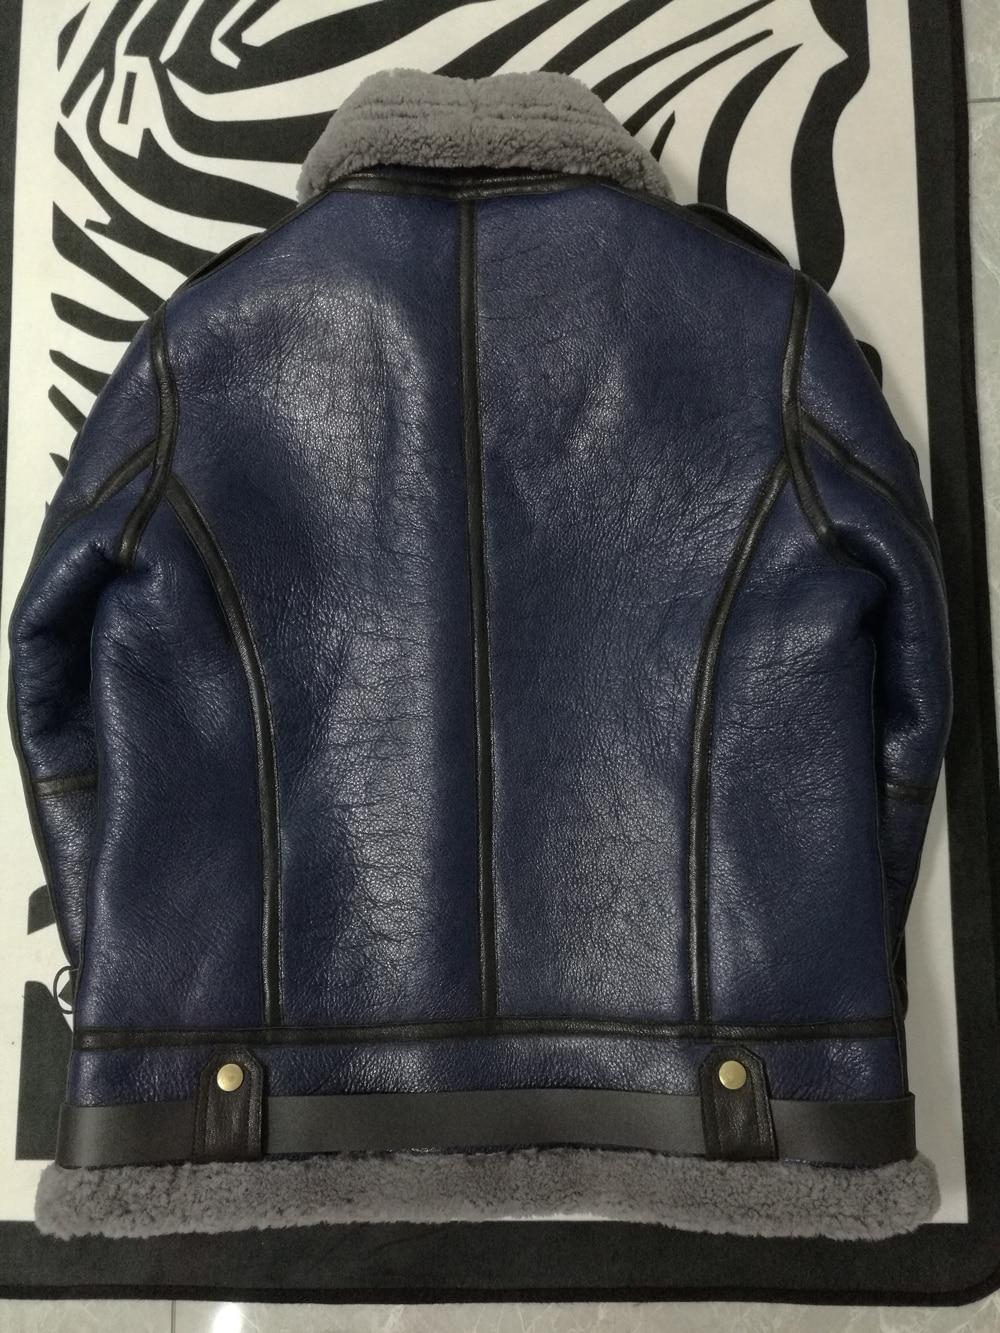 Hf75c0917baf14a2985500ea45151ef85q 2019 Fashion 100% Quality Real Sheepskin Fur Men Coat Genuine Full Pelt Sheep Shearling Male Winter Jacket Brown Men Fur Outwear